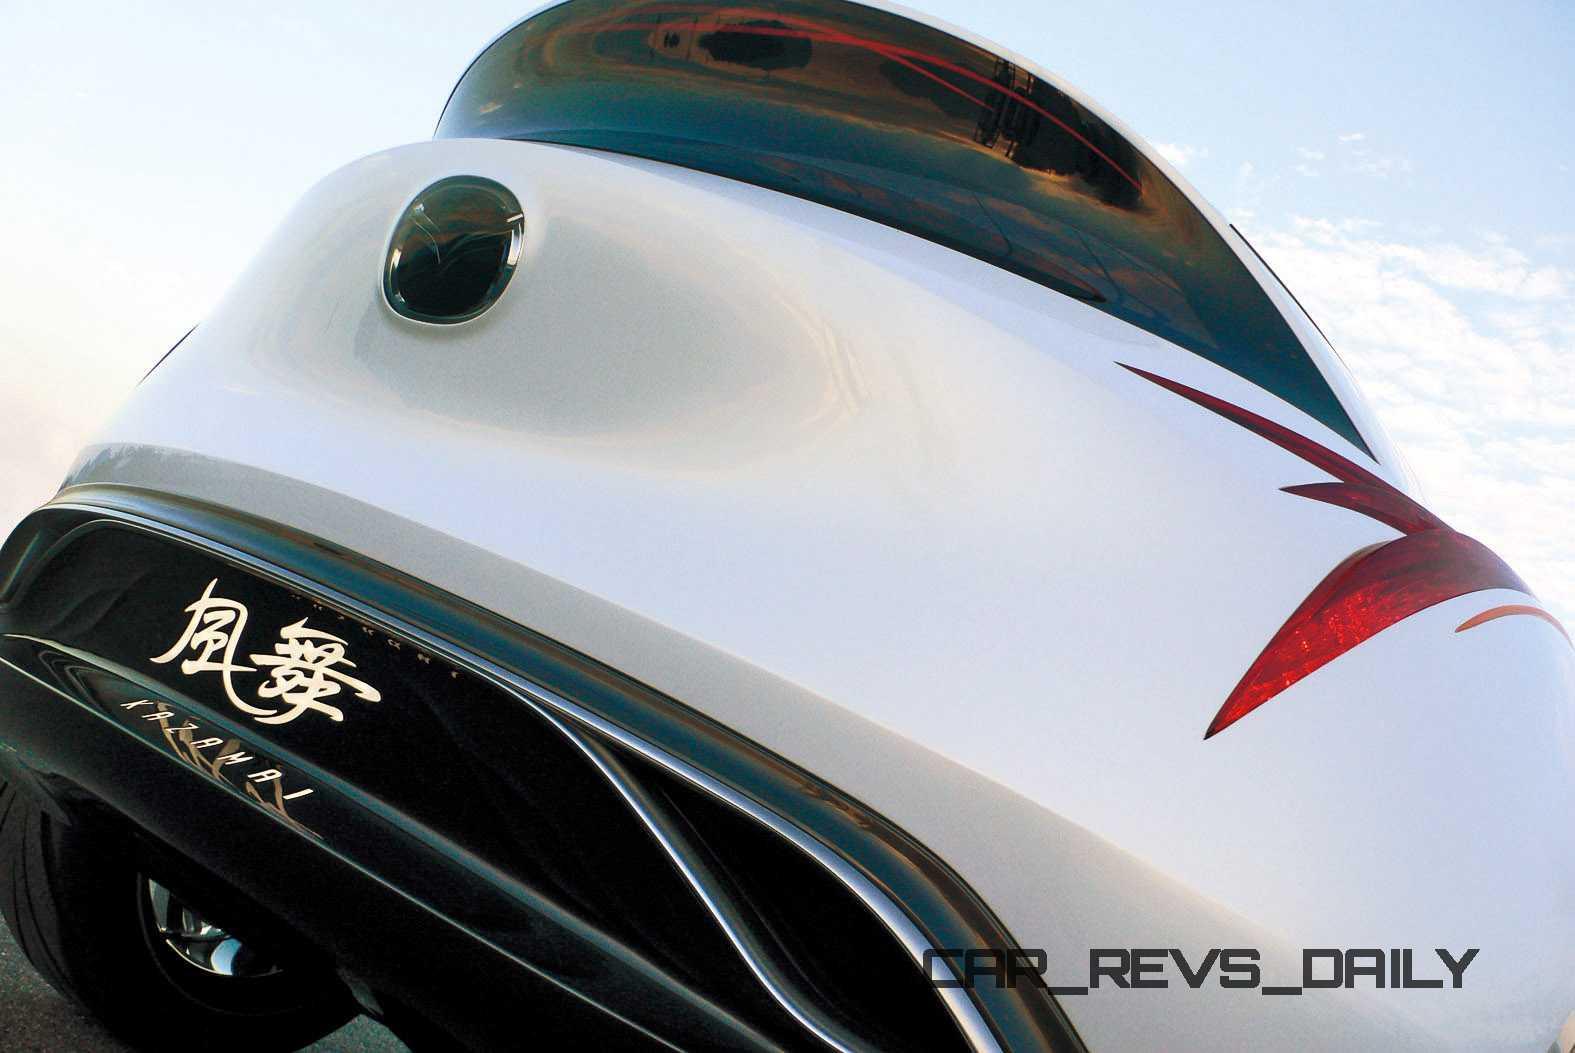 http://www.car-revs-daily.com/wp-content/uploads/2015/03/2008-Mazda-Kazamai-13.jpg